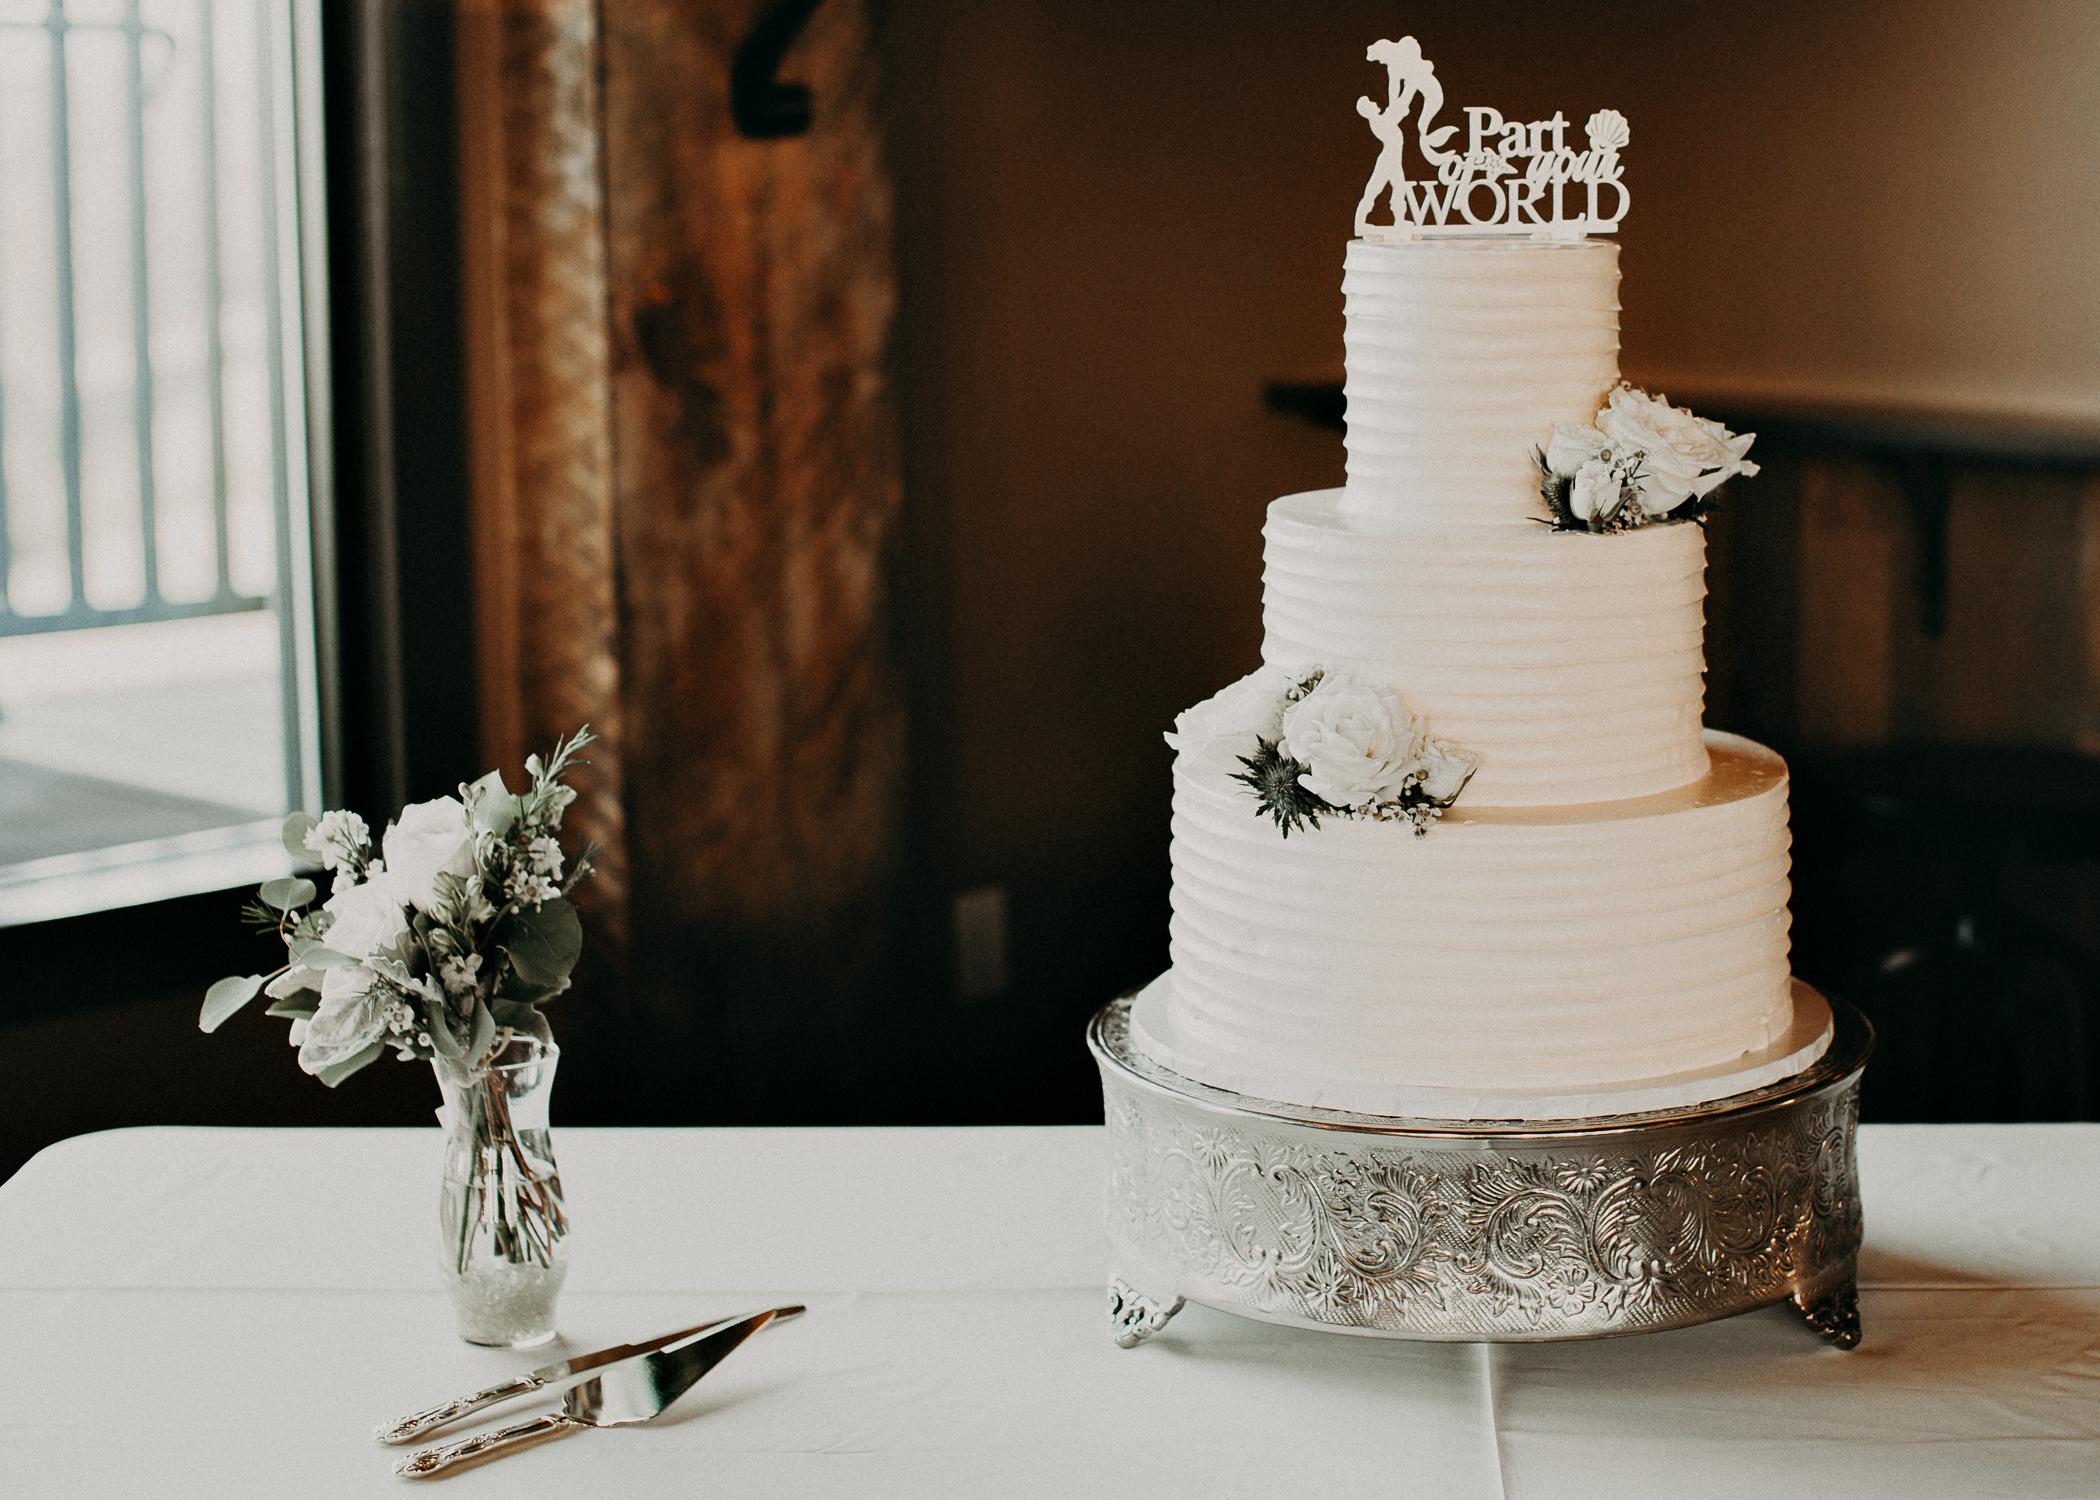 64- Kaya_vineyard_dahlonega_wedding_venue_cake_aline_marin_photography.jpg